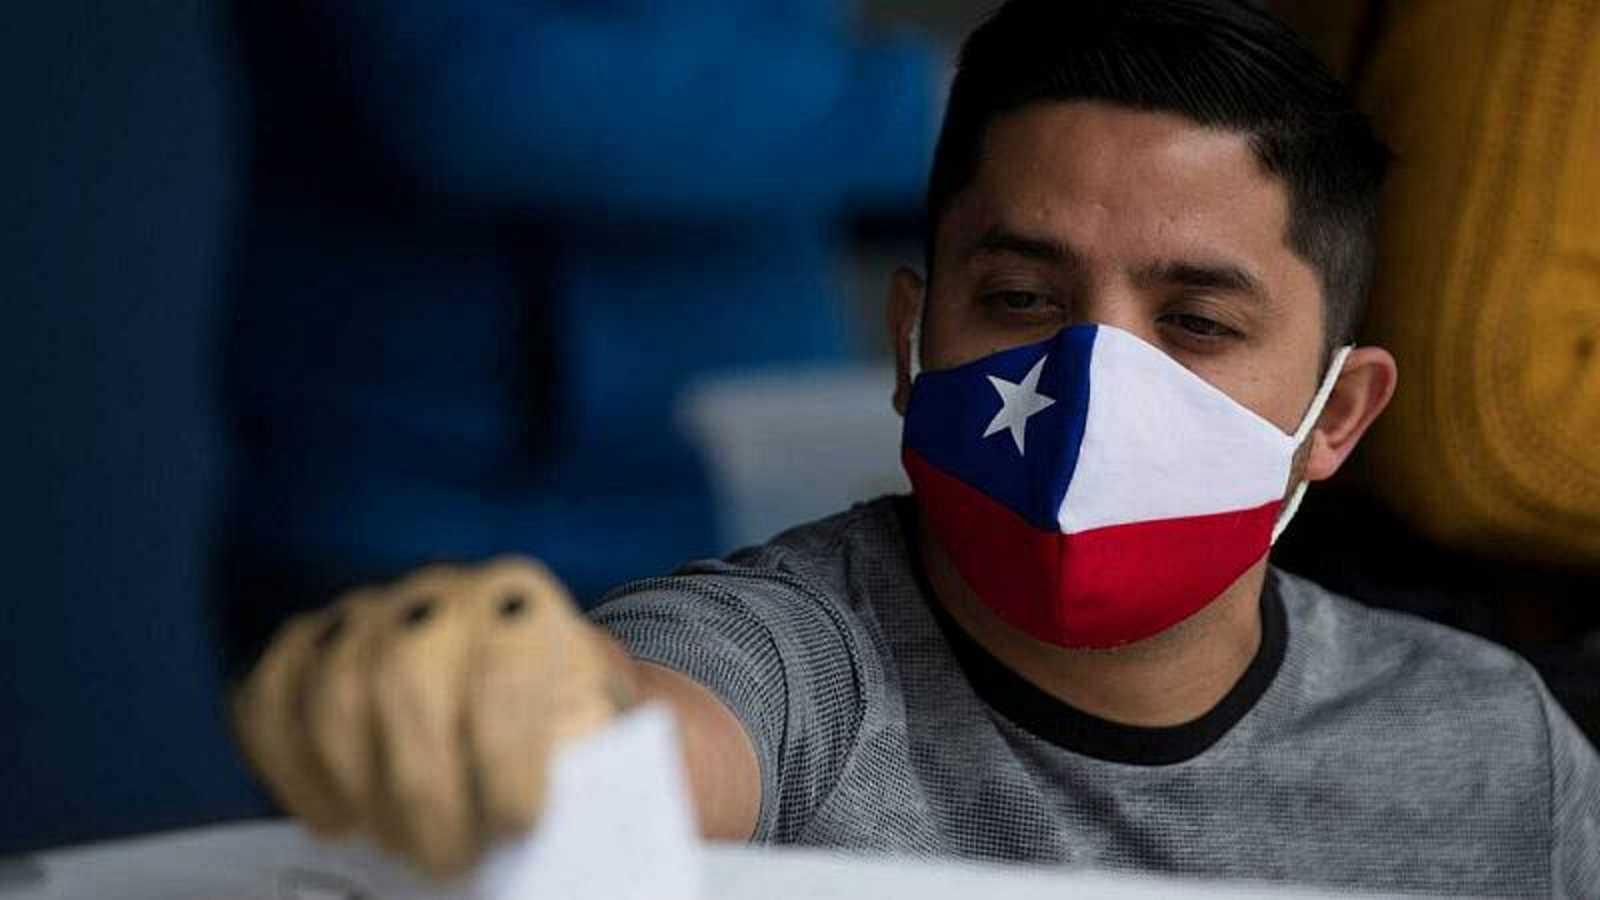 Reportajes 5 Continentes - Chile inicia esta semana un largo proceso electoral - Escuchar ahora